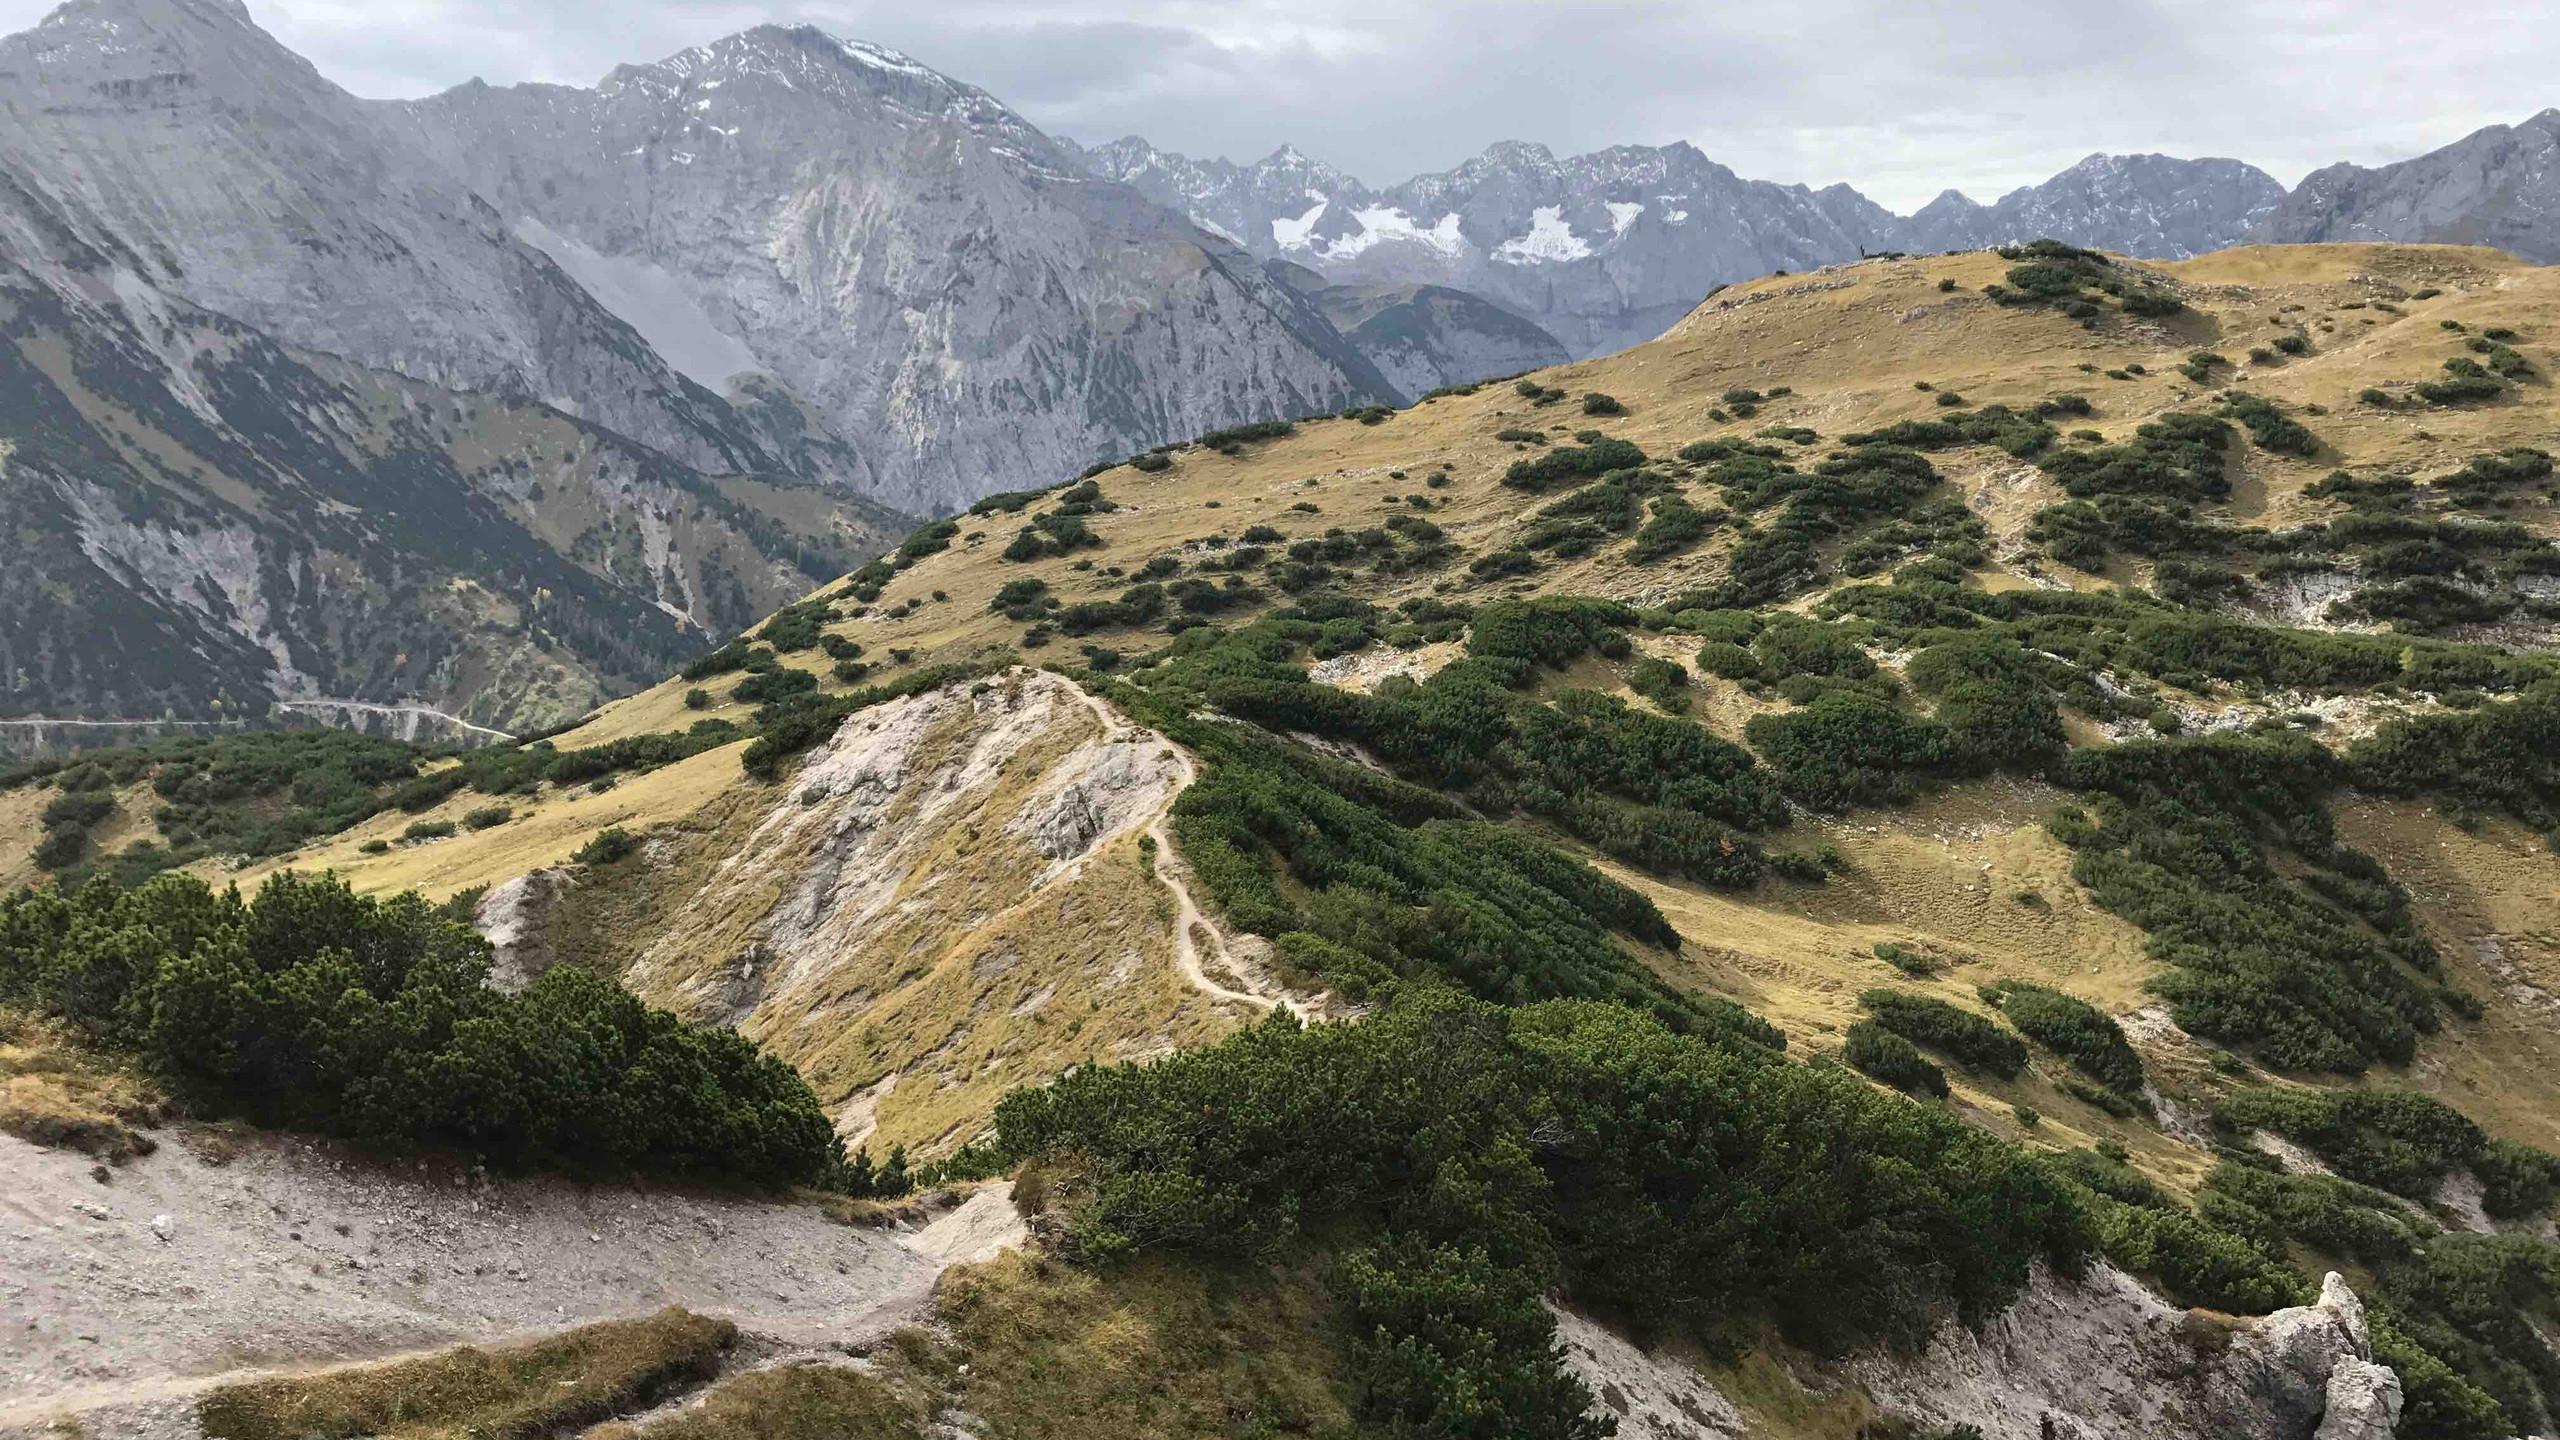 Ueber den Plumssattel zum Plumsjoch, Bergtour Achensee